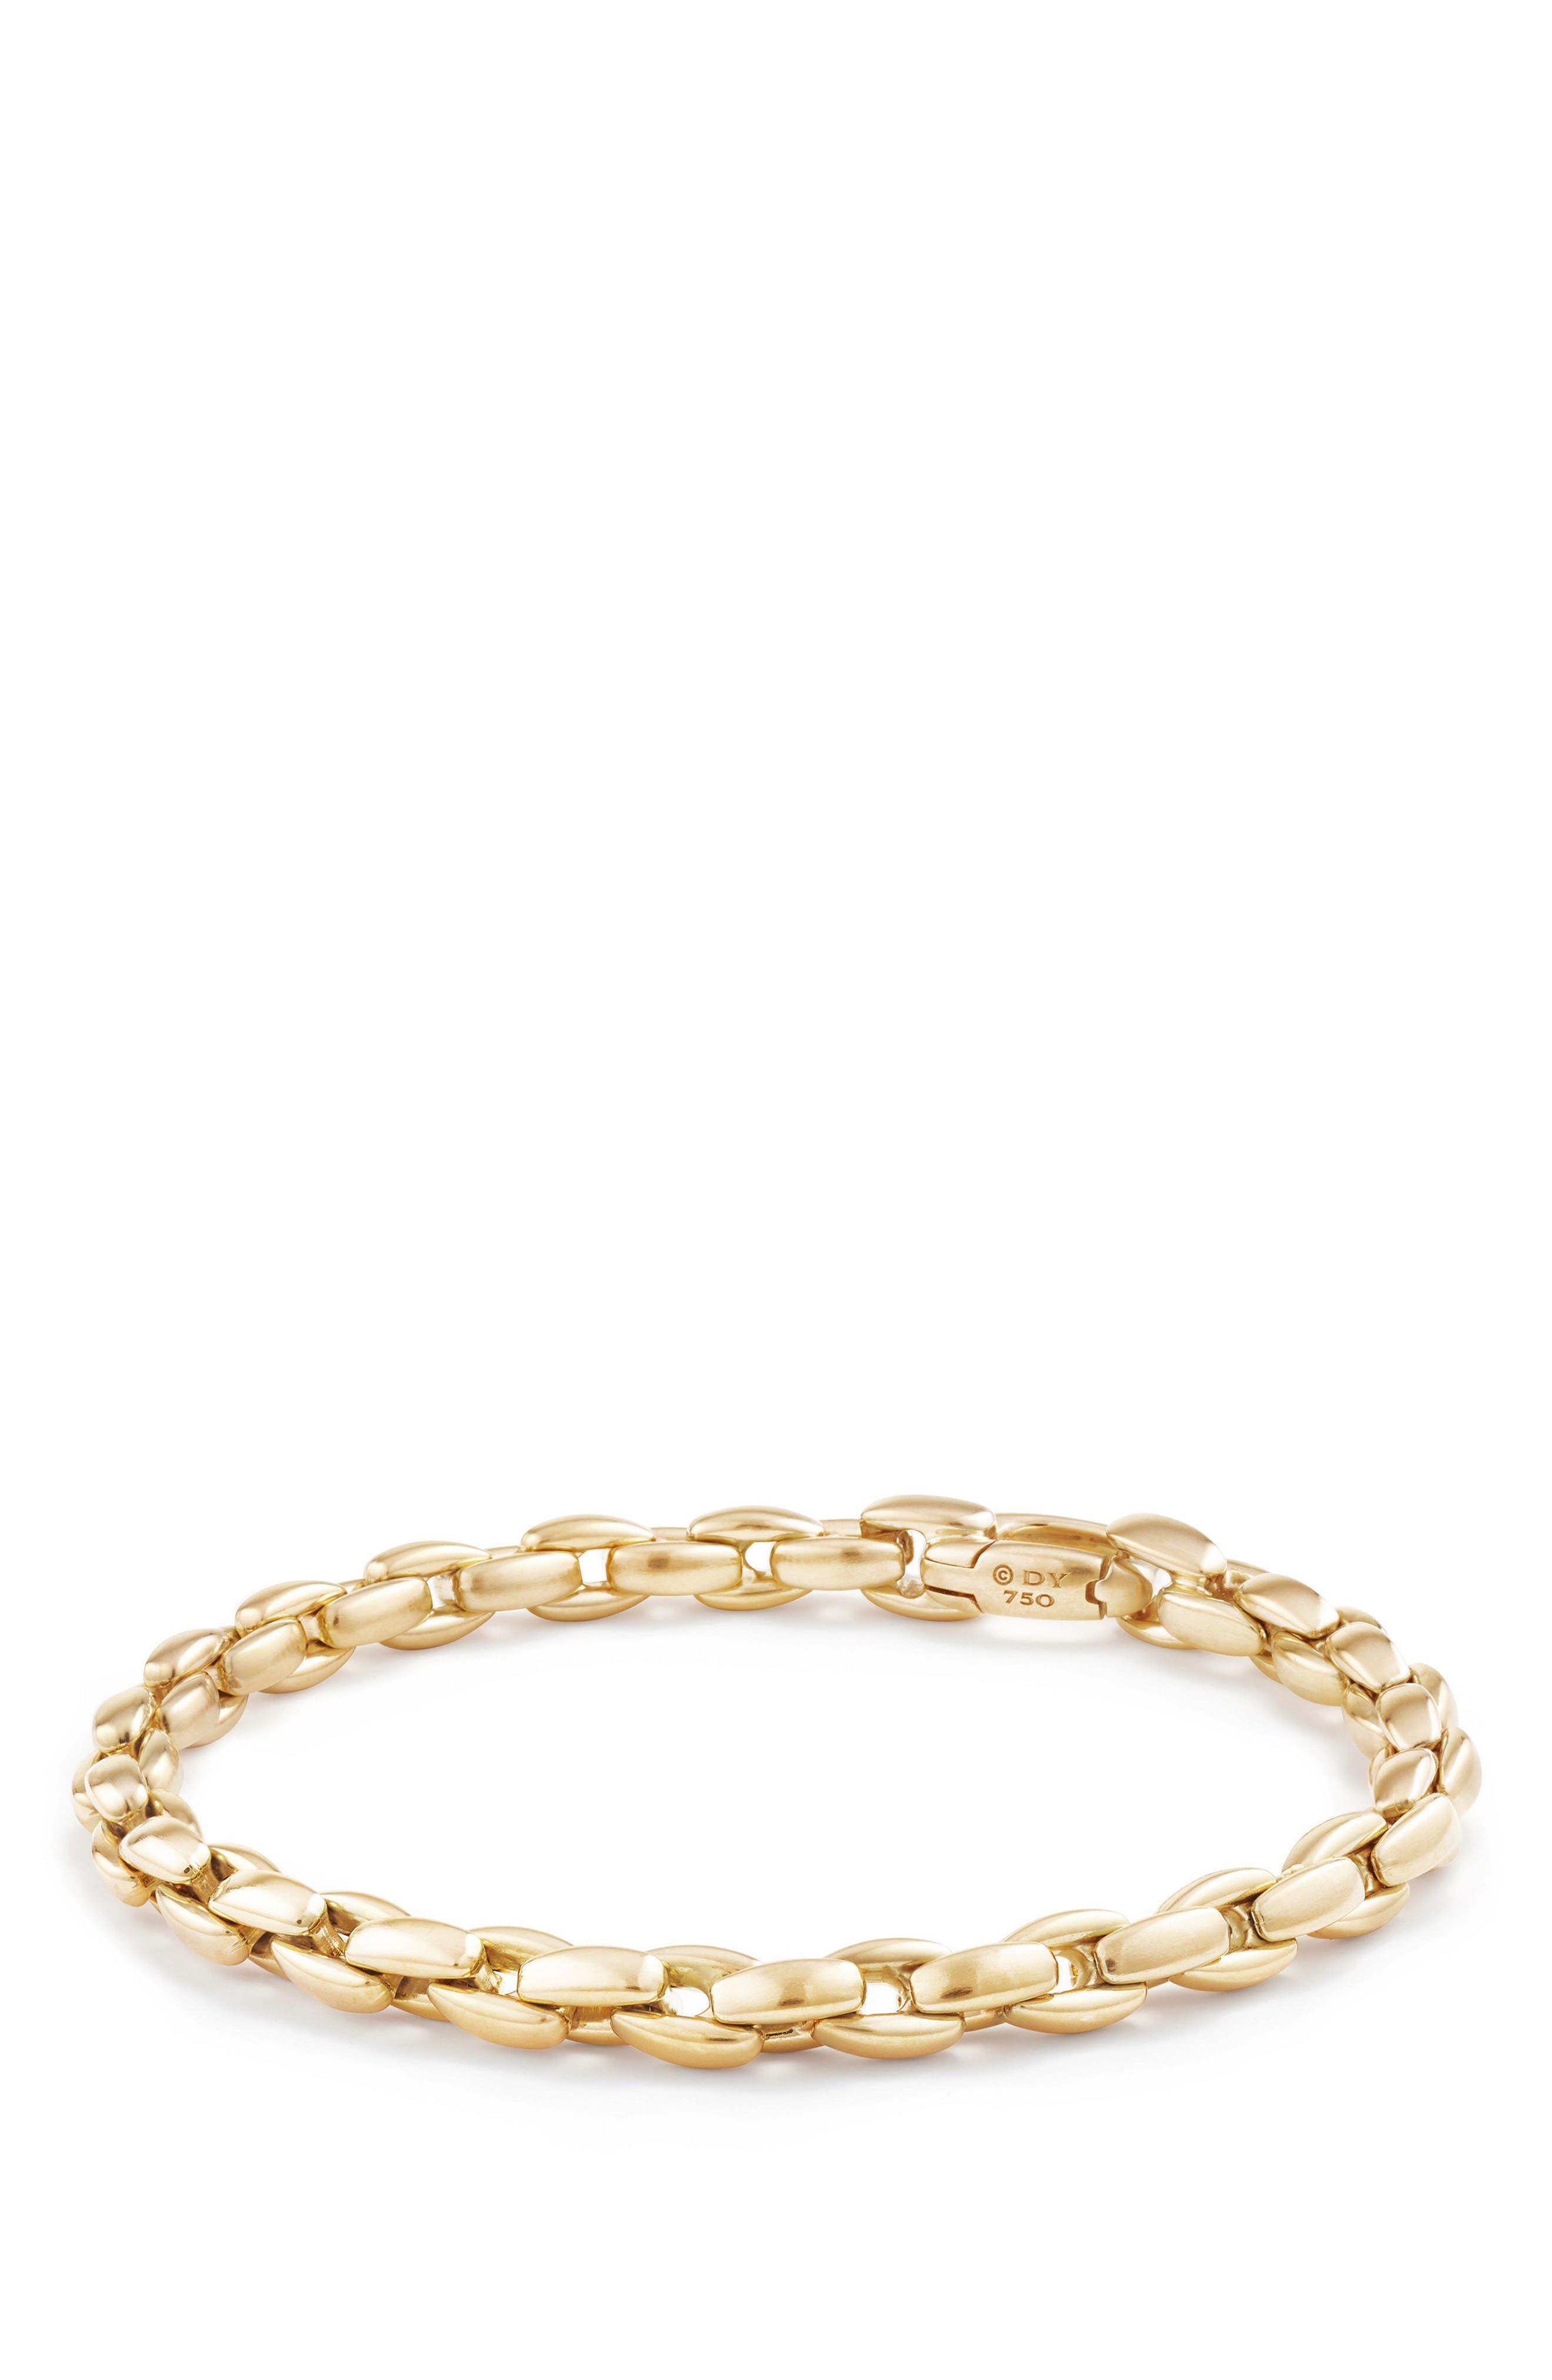 David Yurman Elongated Box Chain Bracelet in 18K Gold, 6mm